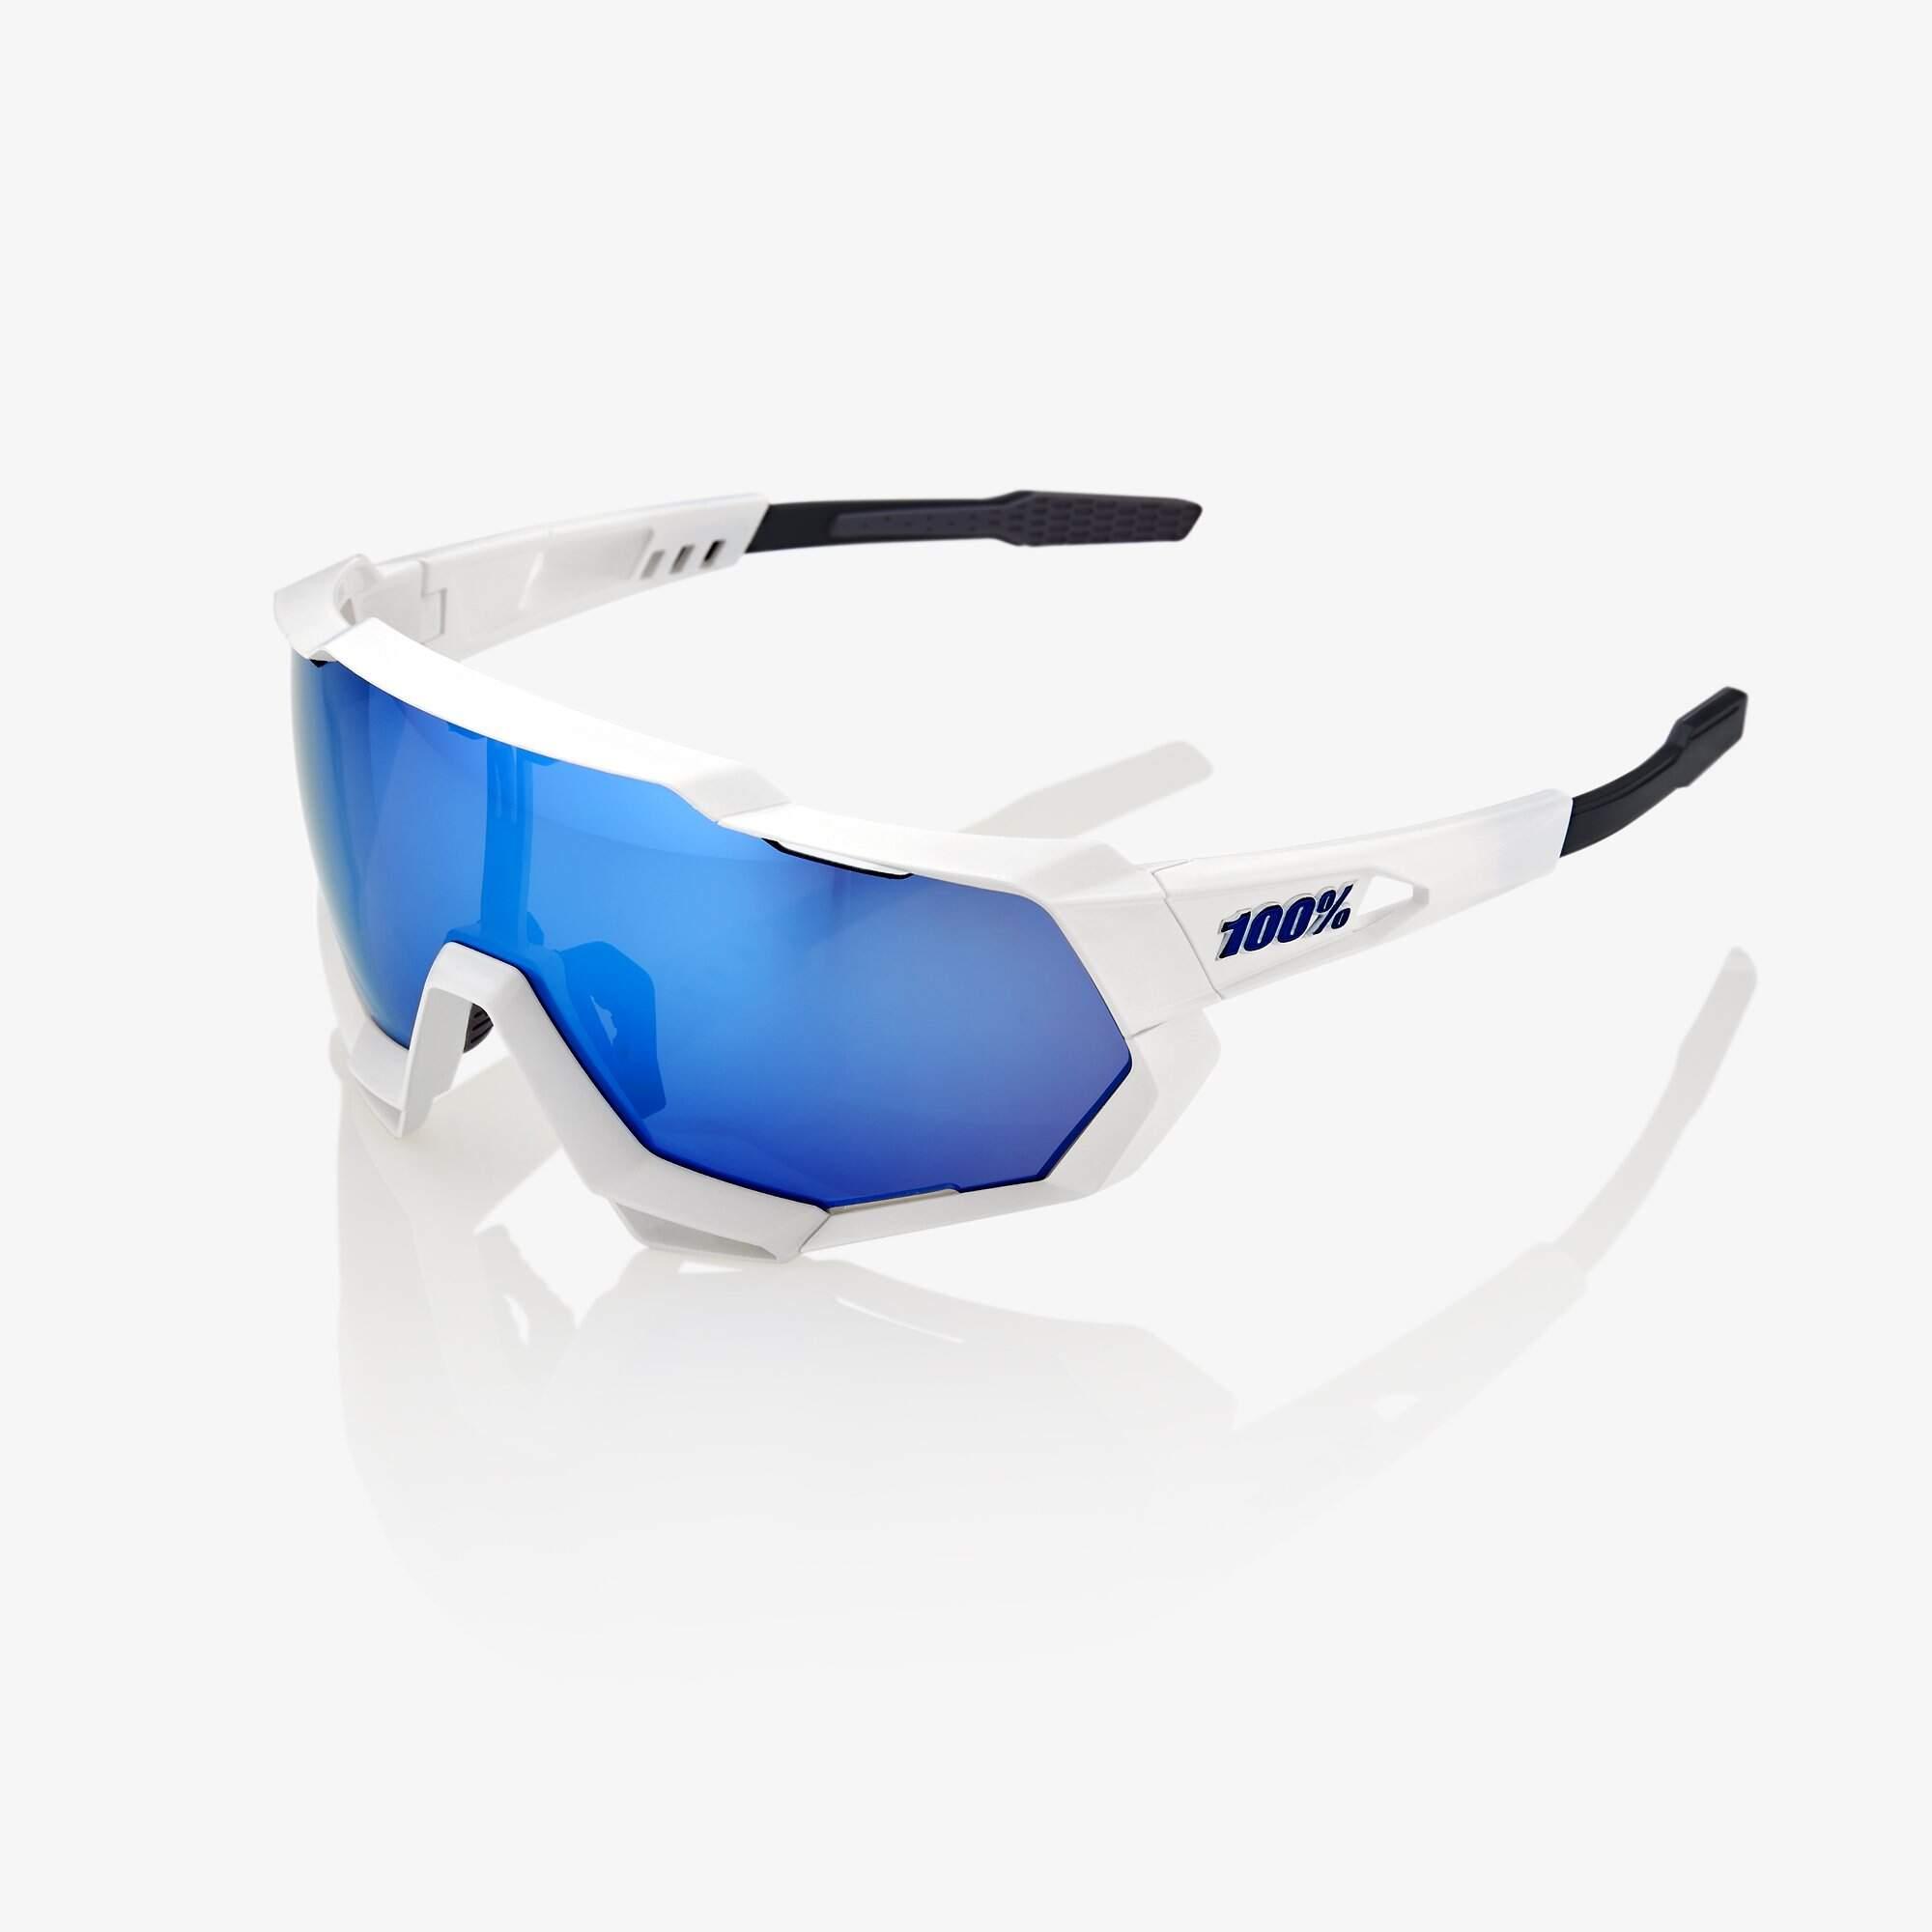 Speedtrap - Blanc mat - Lentille bleue Hiper